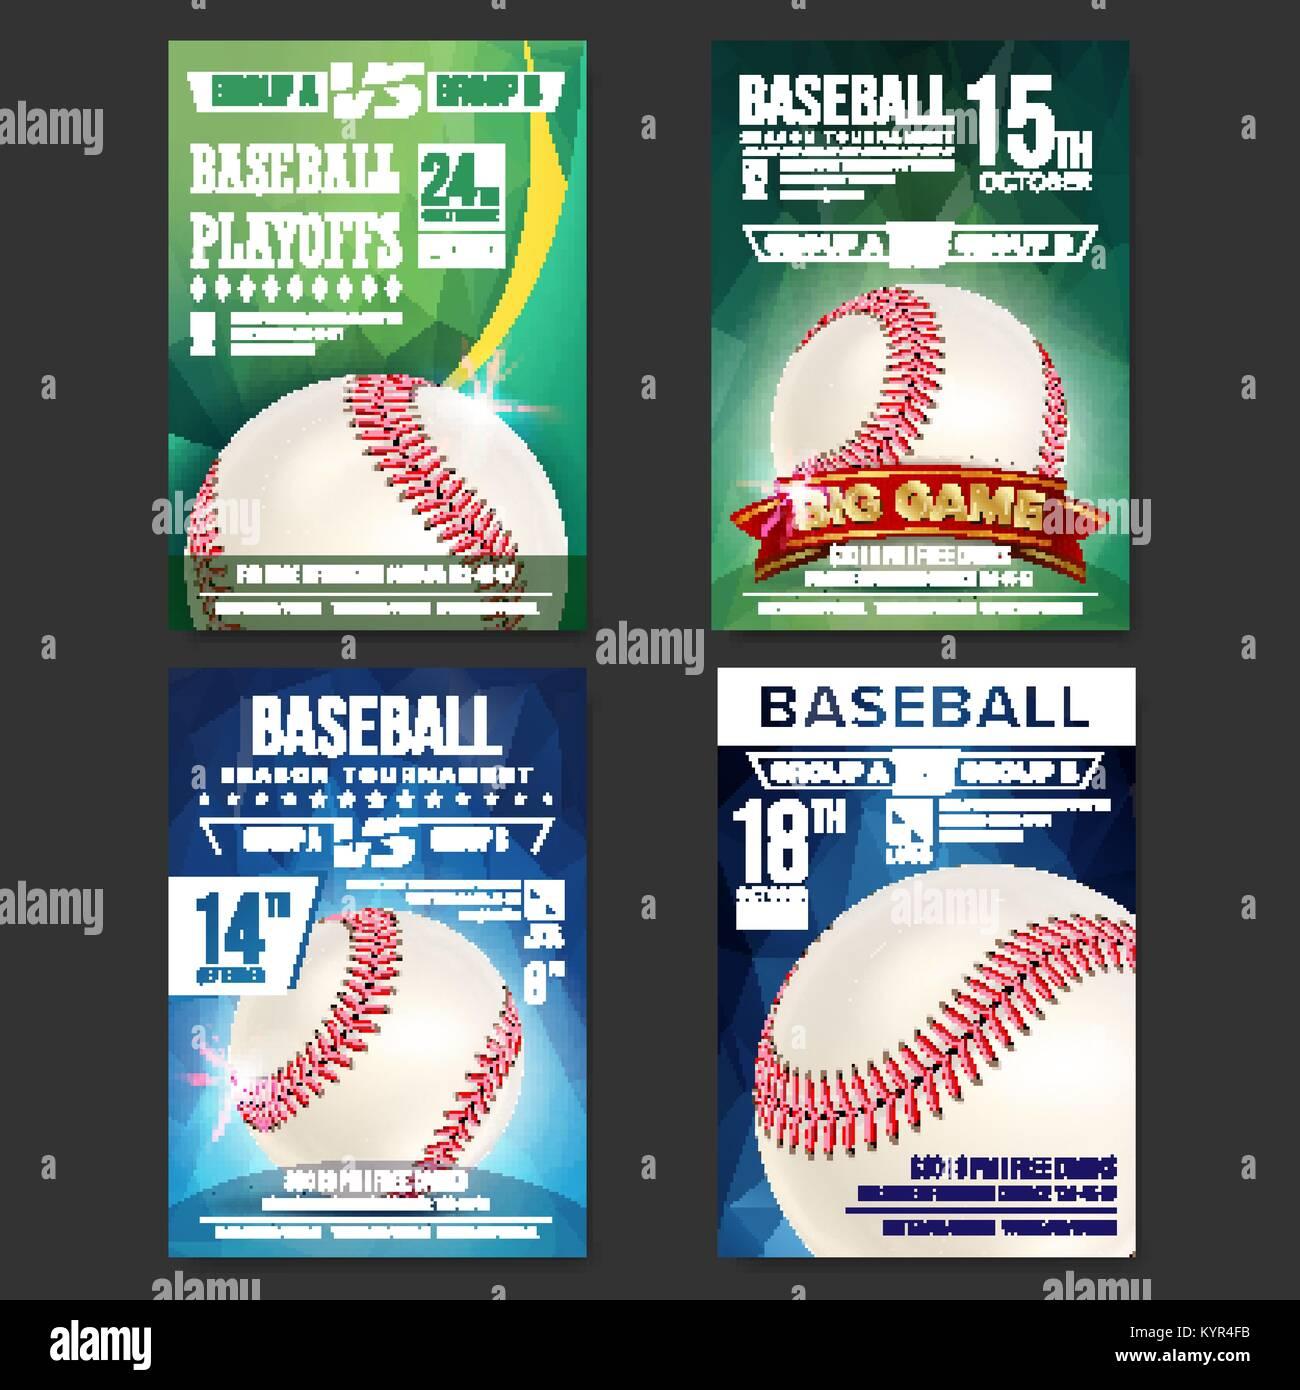 Baseball Poster Set Vector. Design For Sport Bar Promotion. Baseball Ball. Modern Tournament. Sport Event Announcement. Stock Vector